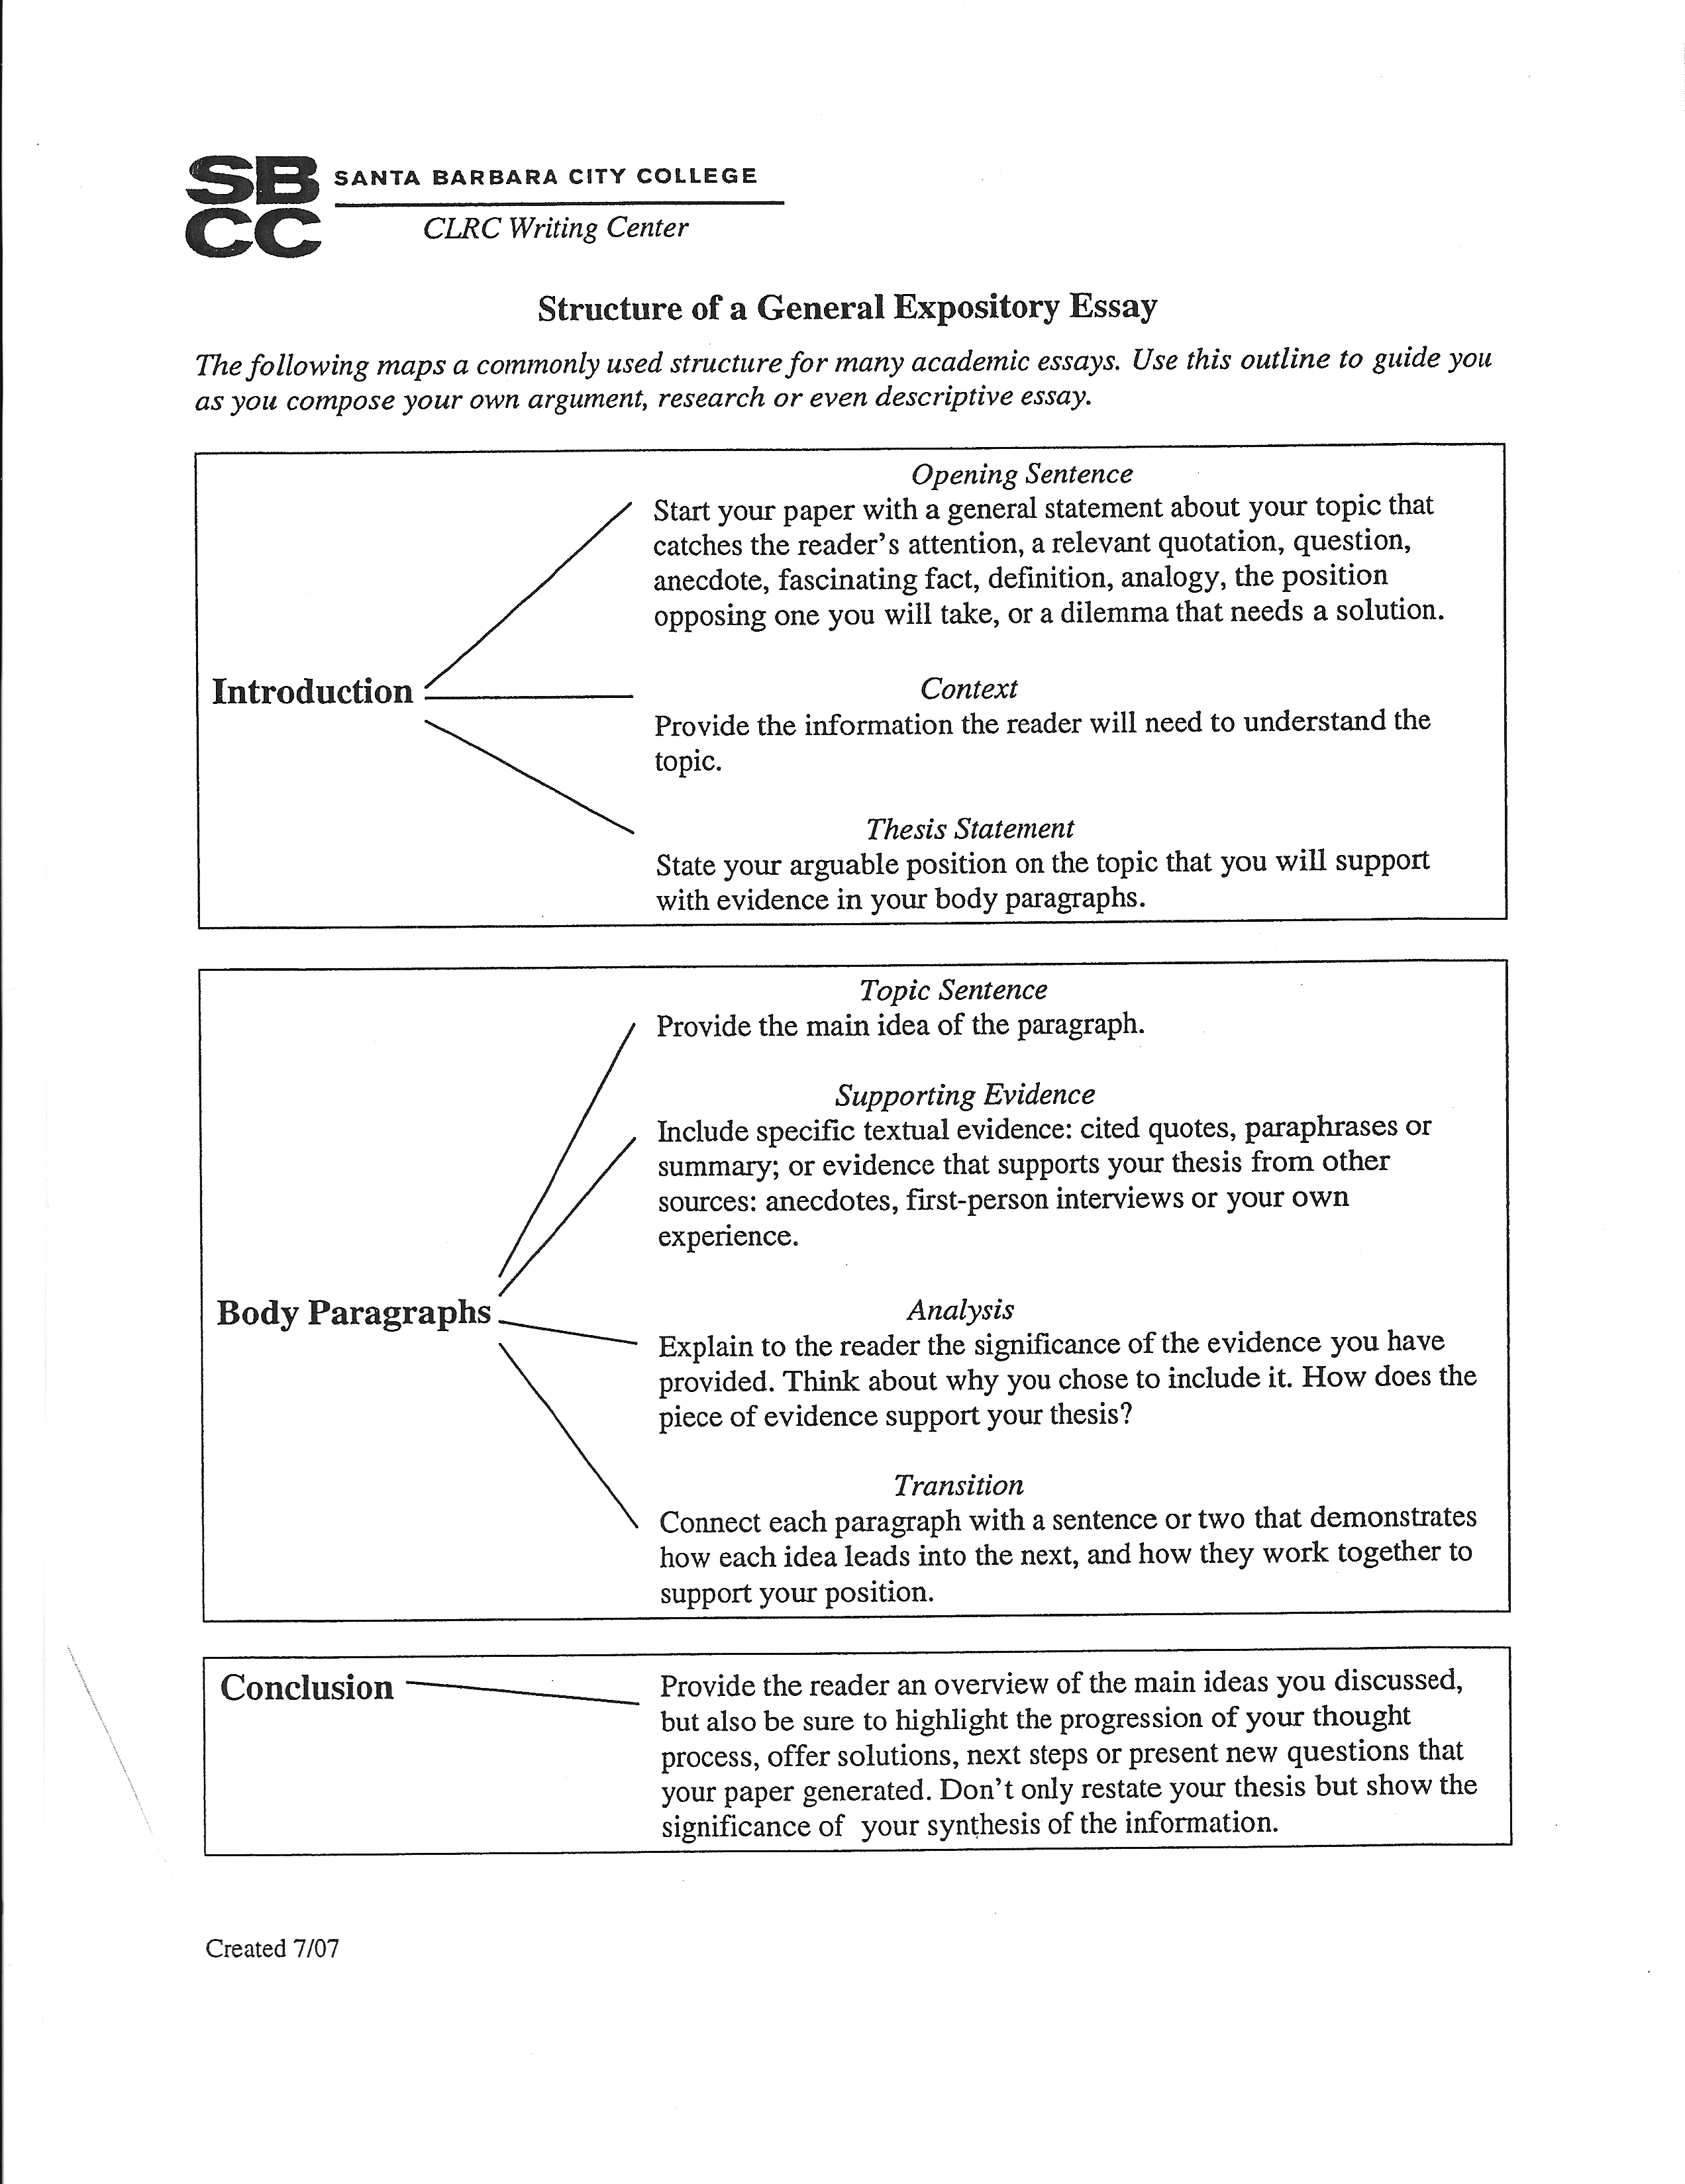 008 Process Essay Outline Fantastic Template Pdf Full